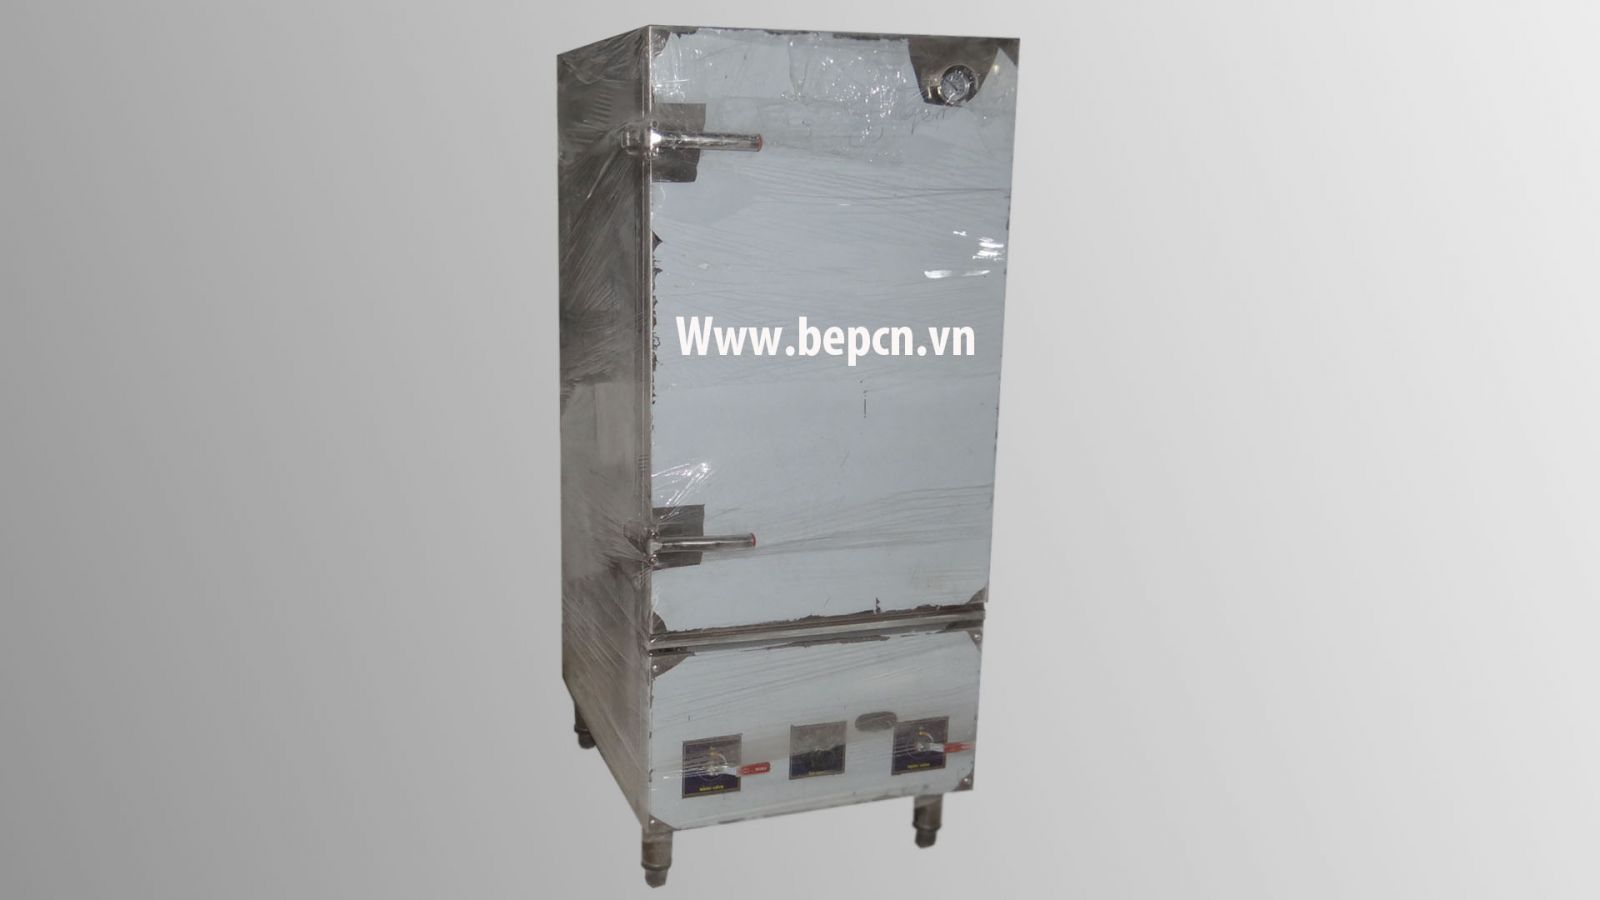 Tủ cơm công nghiệp 30kg Model SCTC - DG30